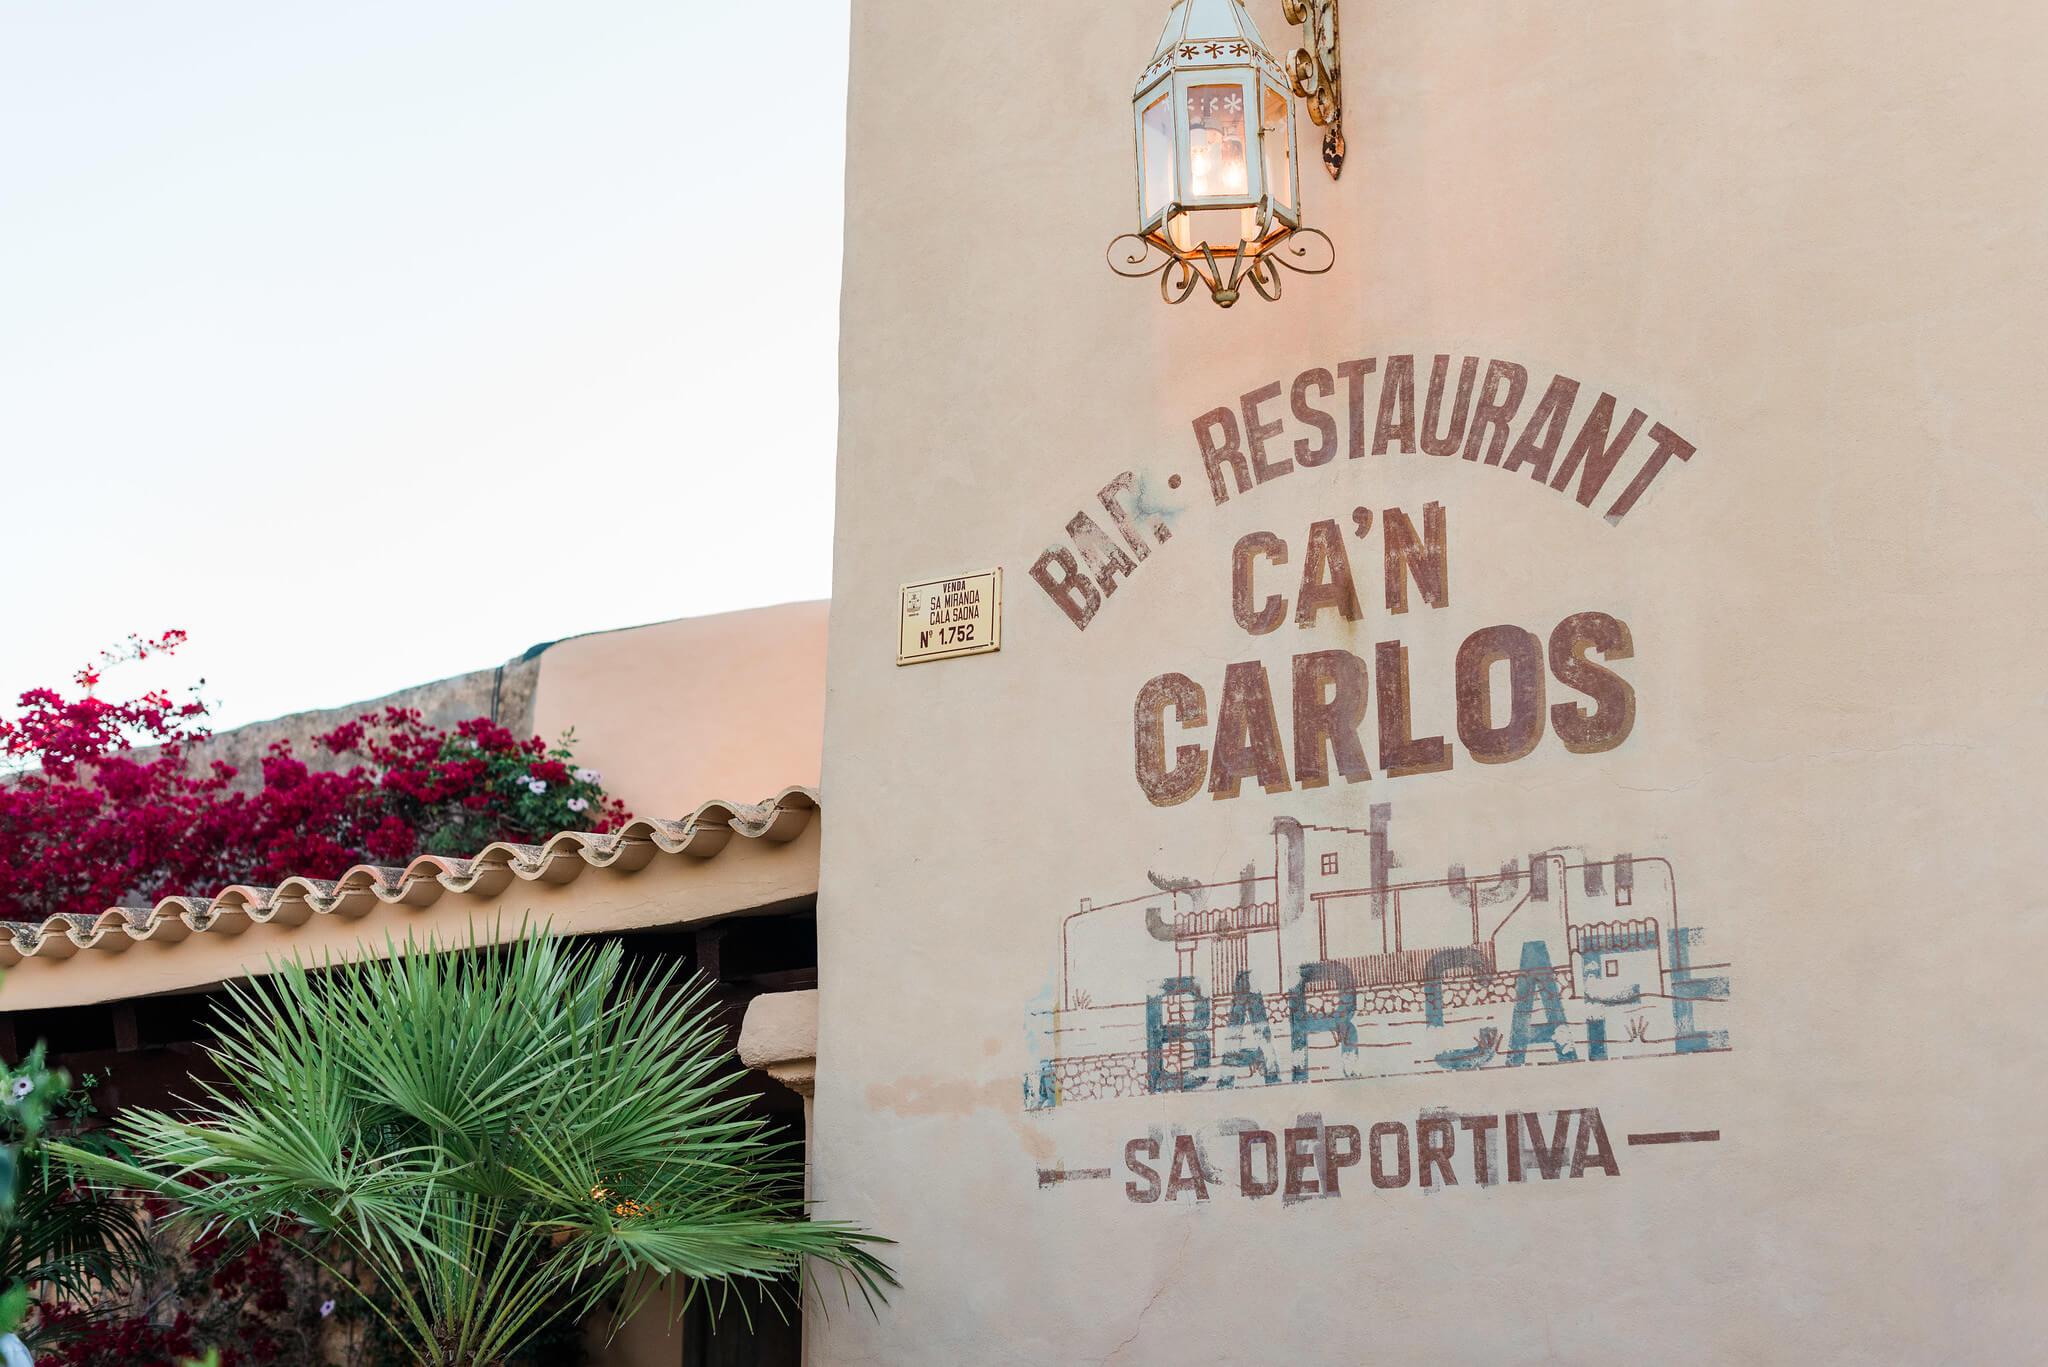 https://www.white-ibiza.com/wp-content/uploads/2020/03/formentera-restaurants-can-carlos-2020-11.jpg